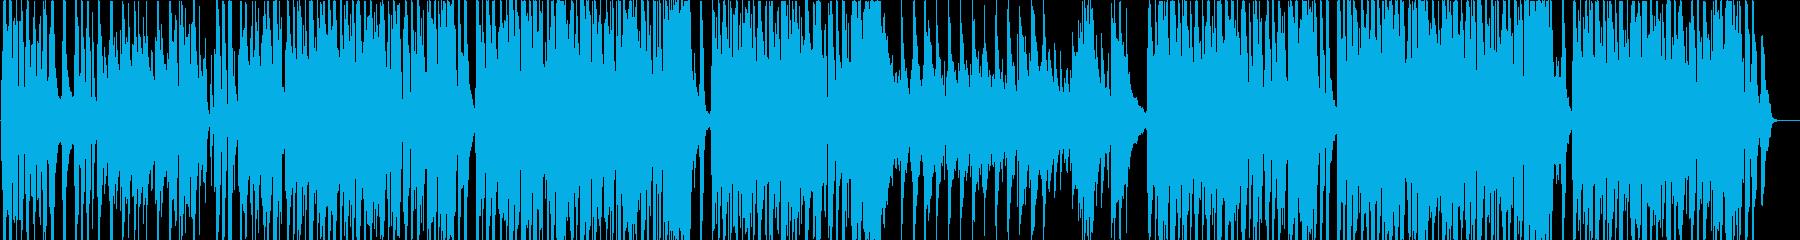 Kitten Skipの再生済みの波形